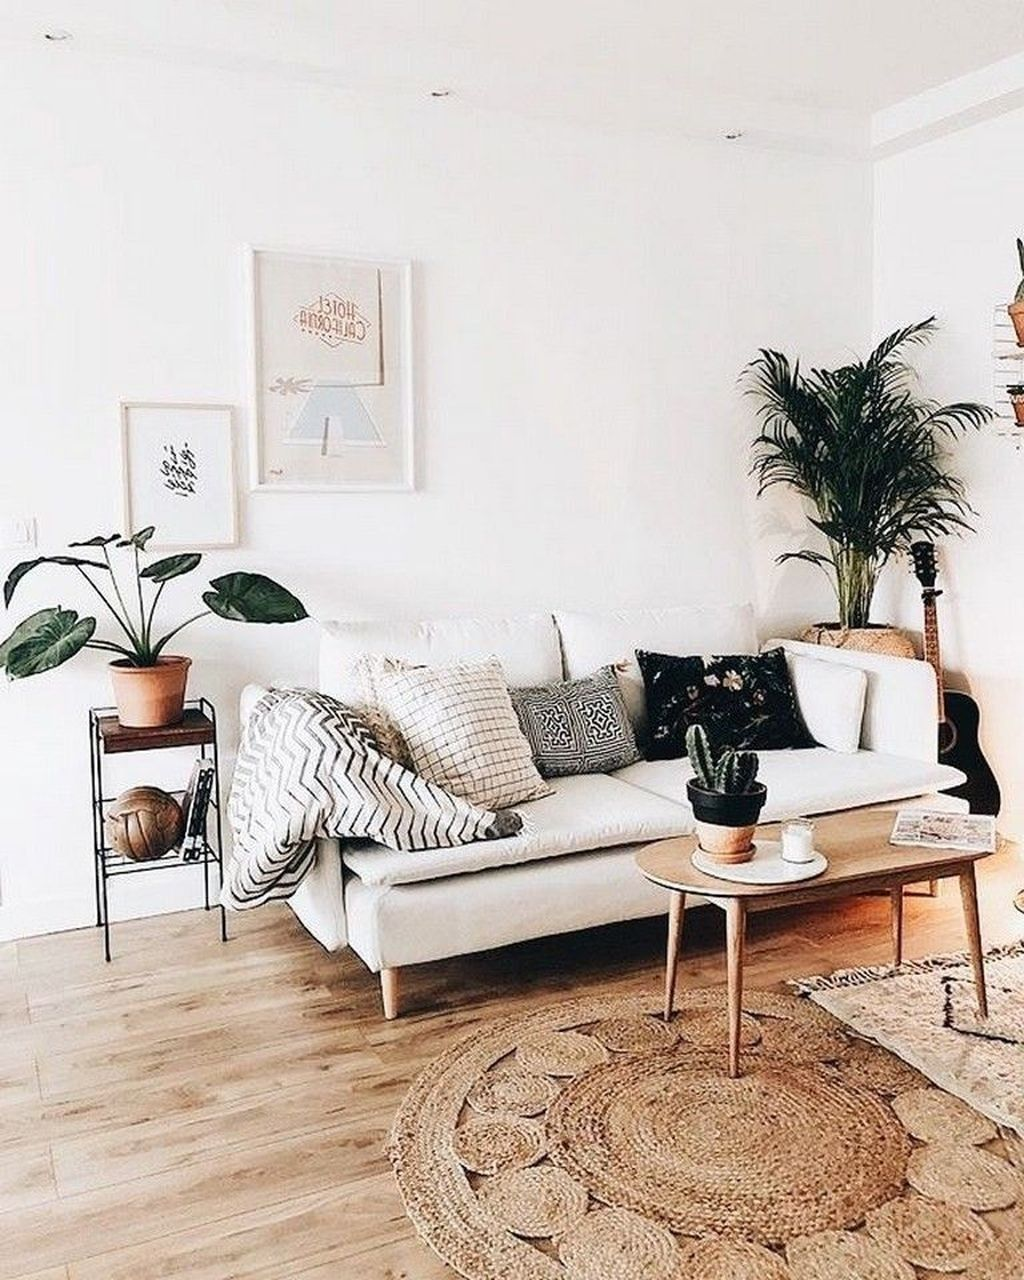 36 Unique Bohemian Living Room Decor Ideas Creating A Shabby Chic